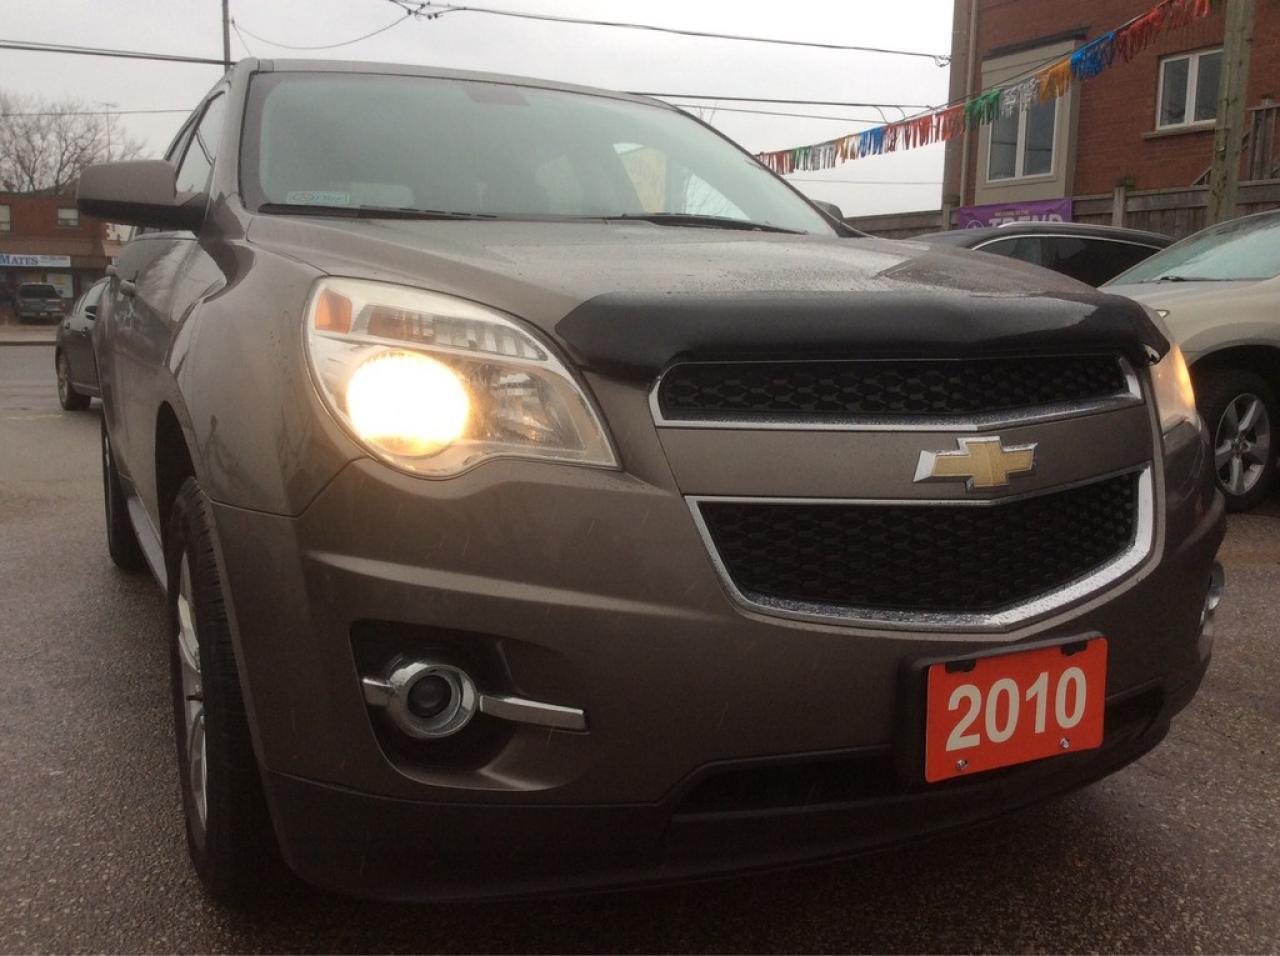 2010 Chevrolet Equinox 4 Cyl. Bk-Up Cam Bluetooth Sunroof Alloys MINT